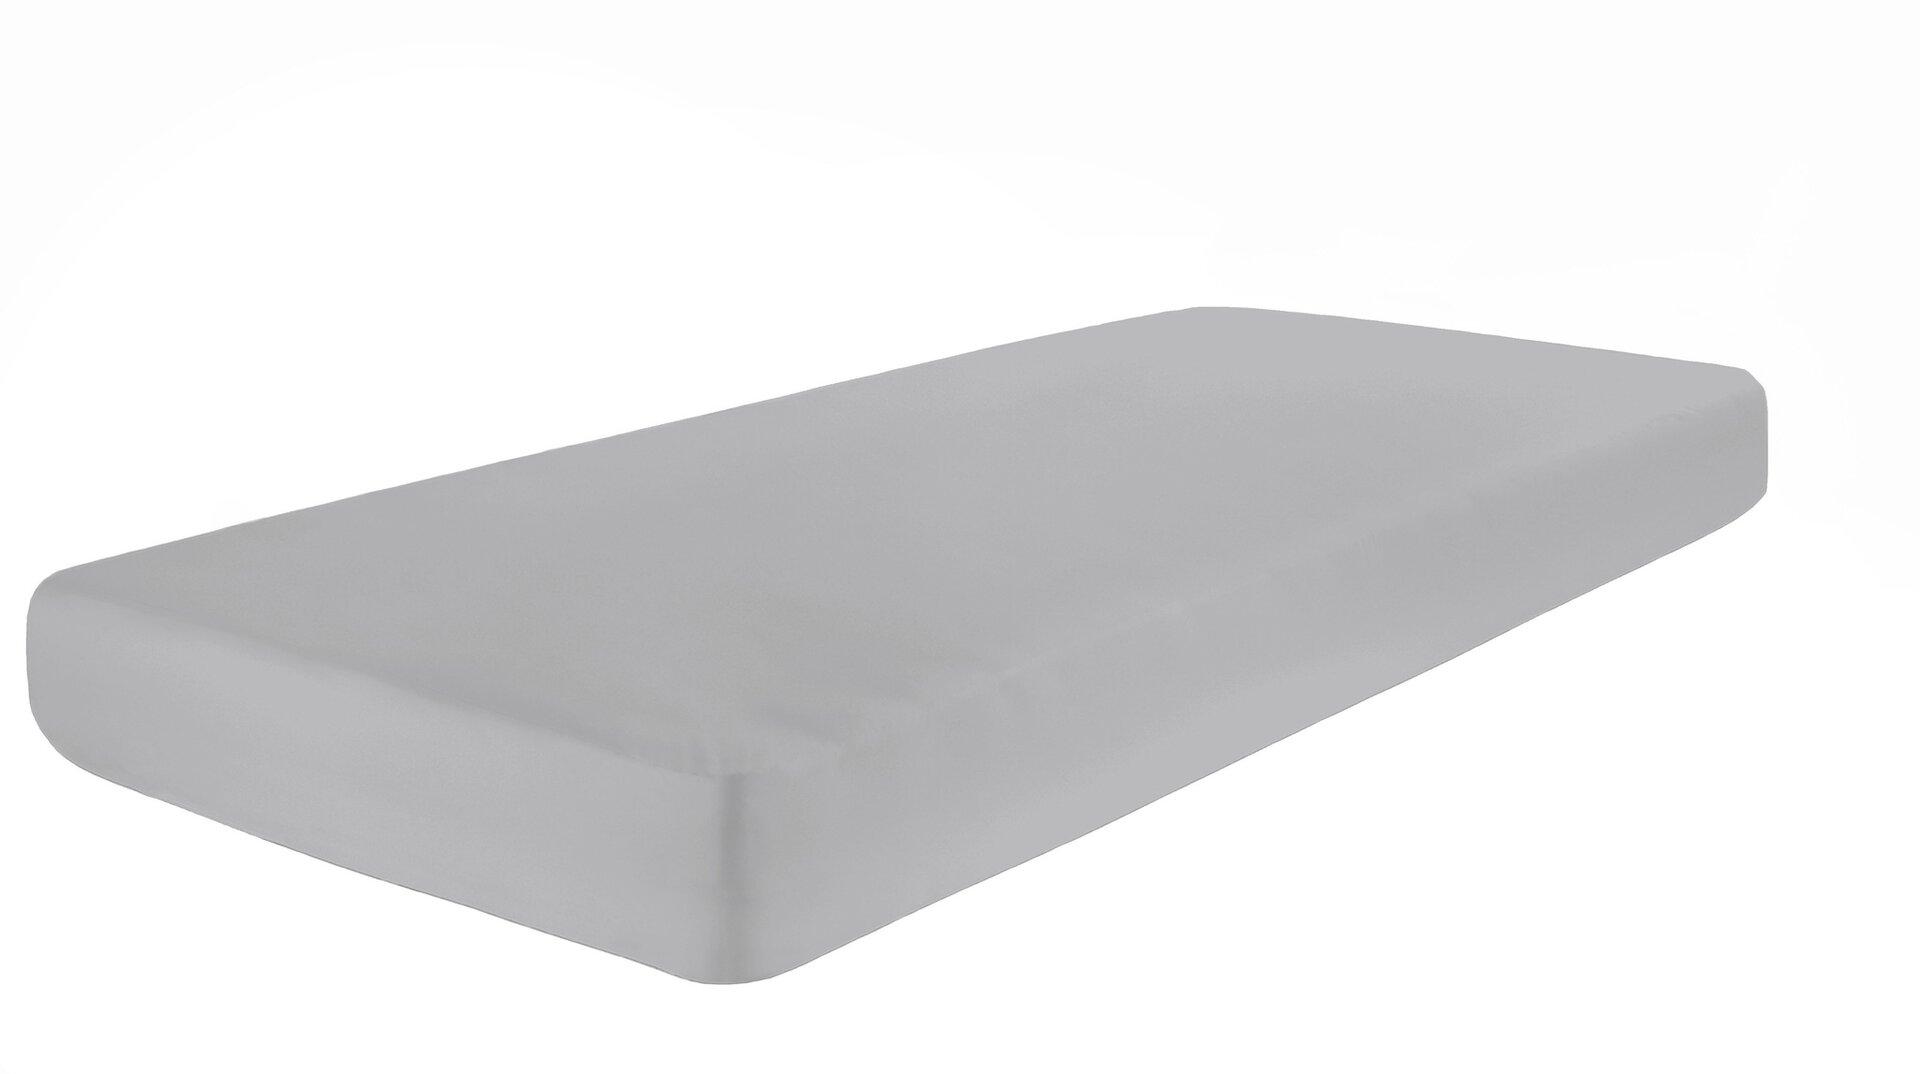 Elastan Jersey Boxspring-Spannbetttuch Pro Night Textil silber 2 x 2 cm